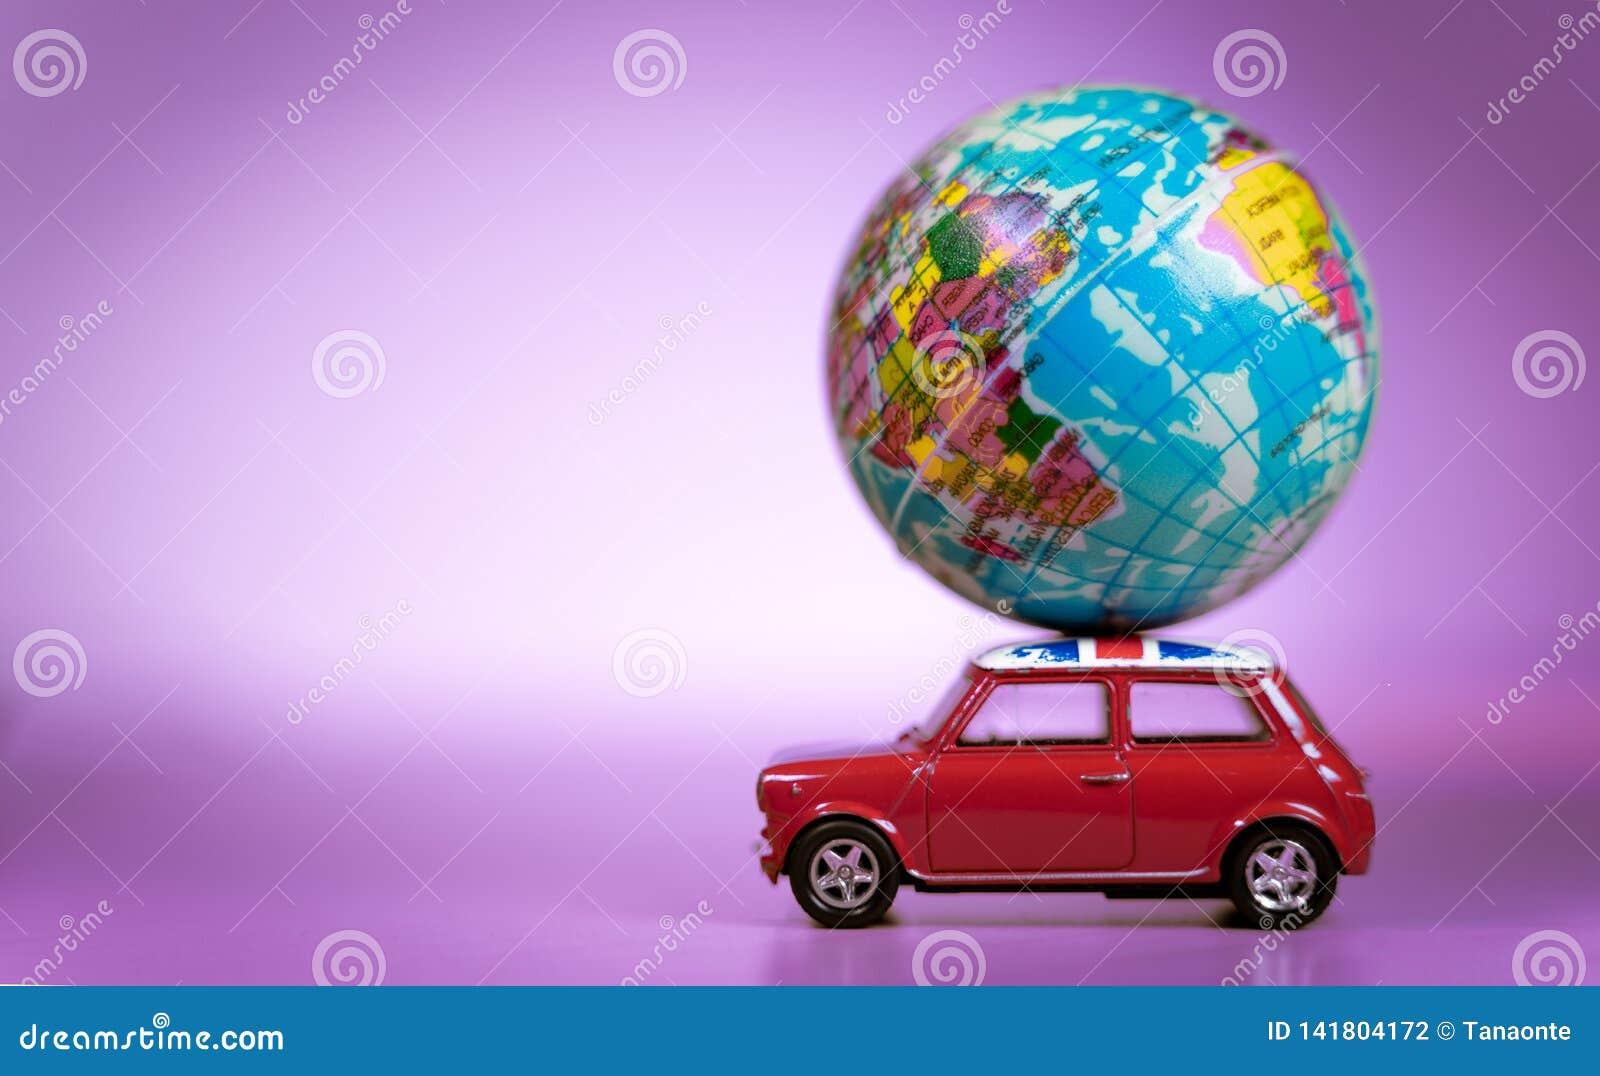 Portant Voiture Un Cru Miniature Ballon Jouet Du De Carte YE2H9IWD